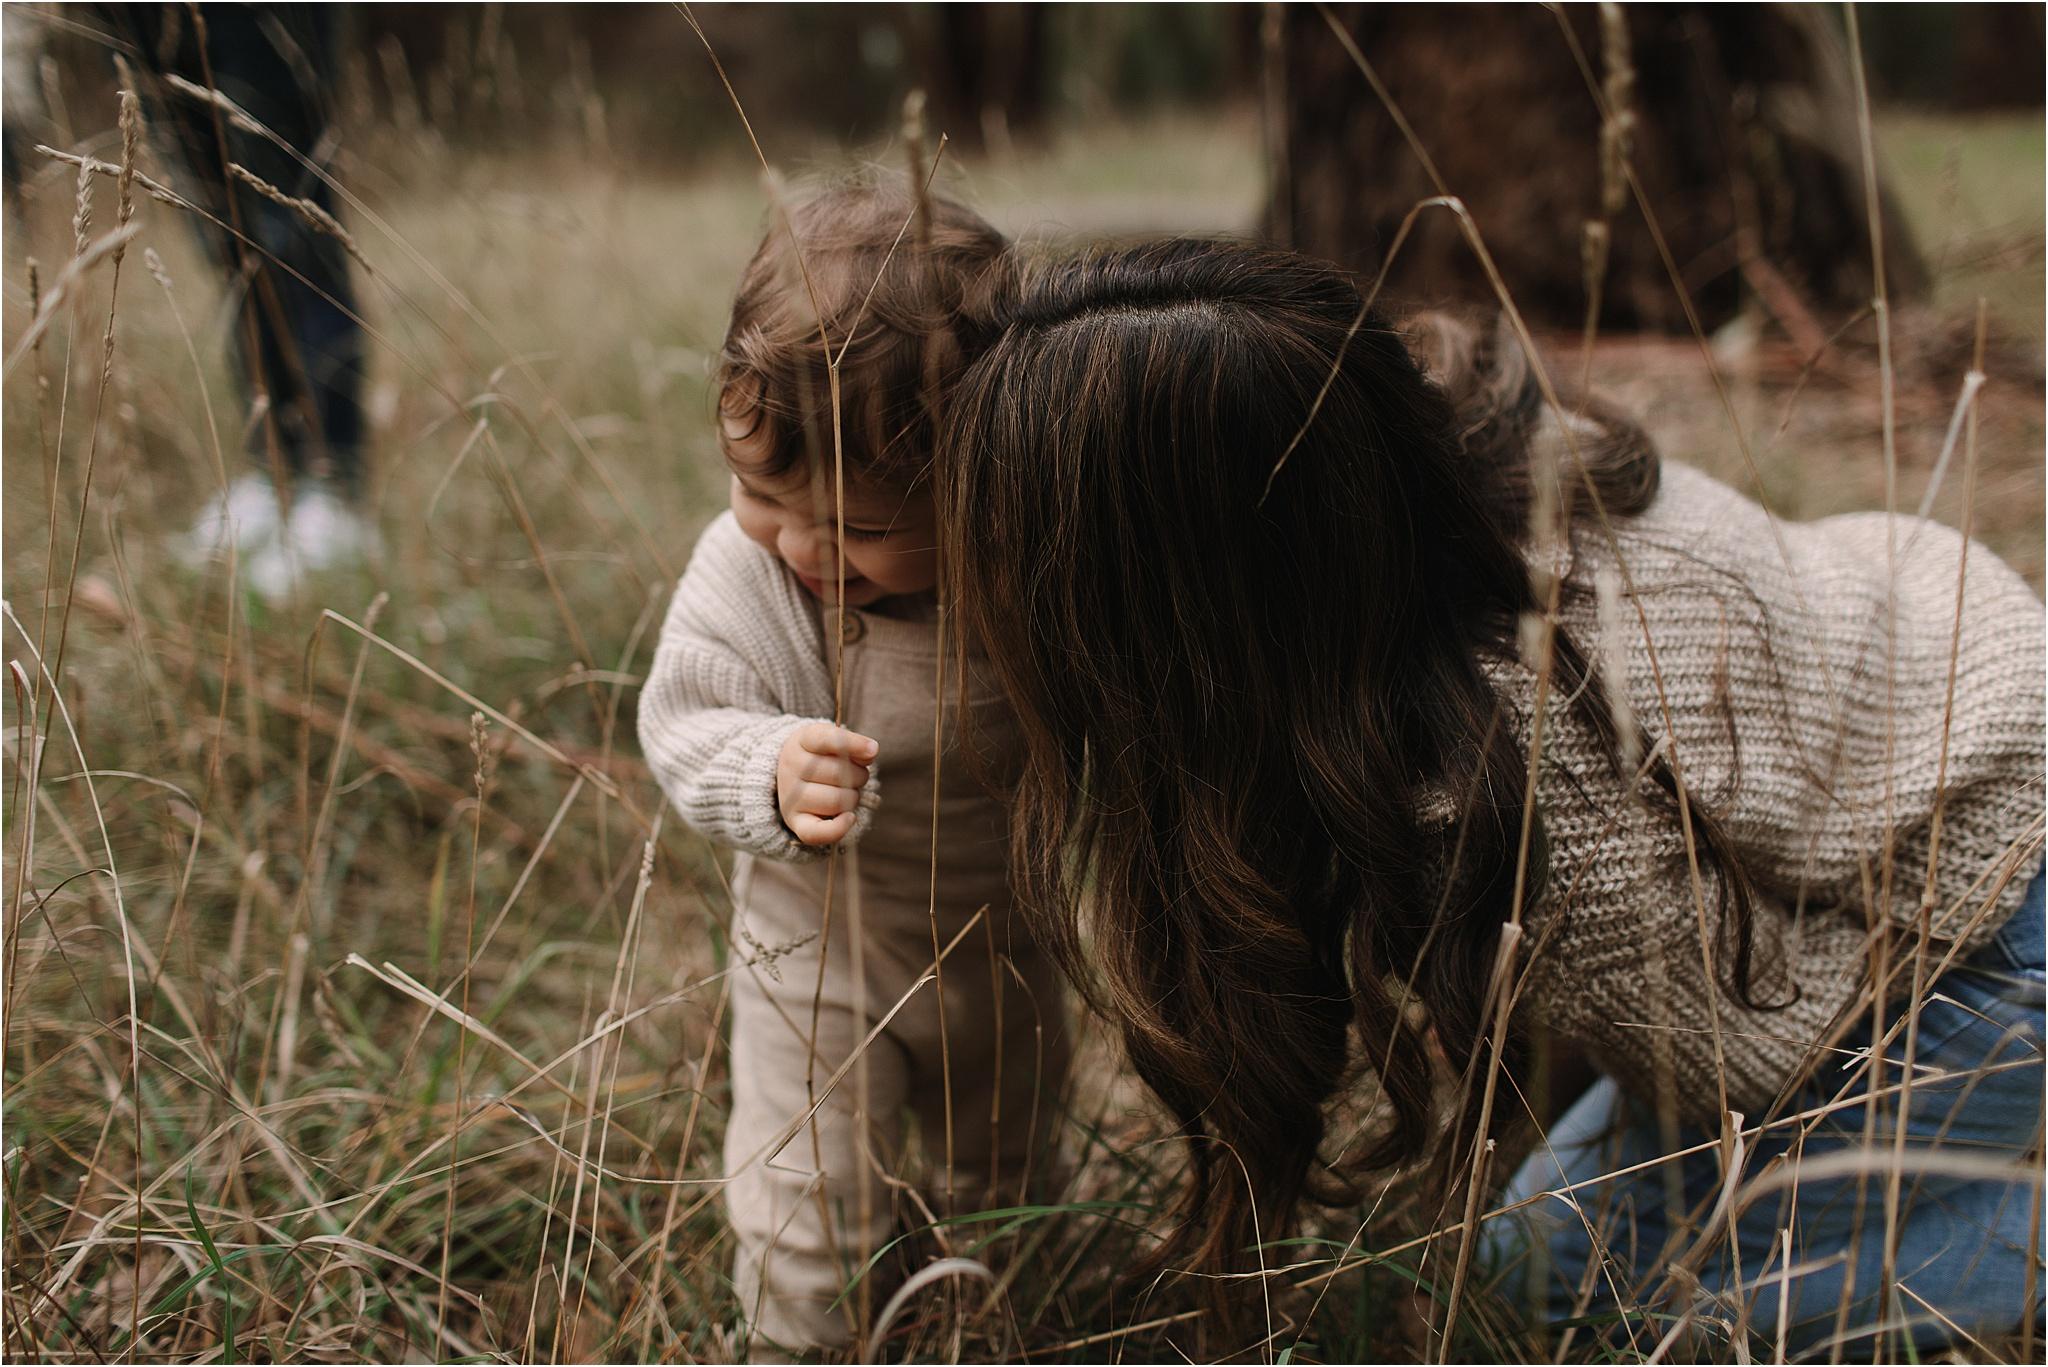 Mum kissing her toddler in long grass